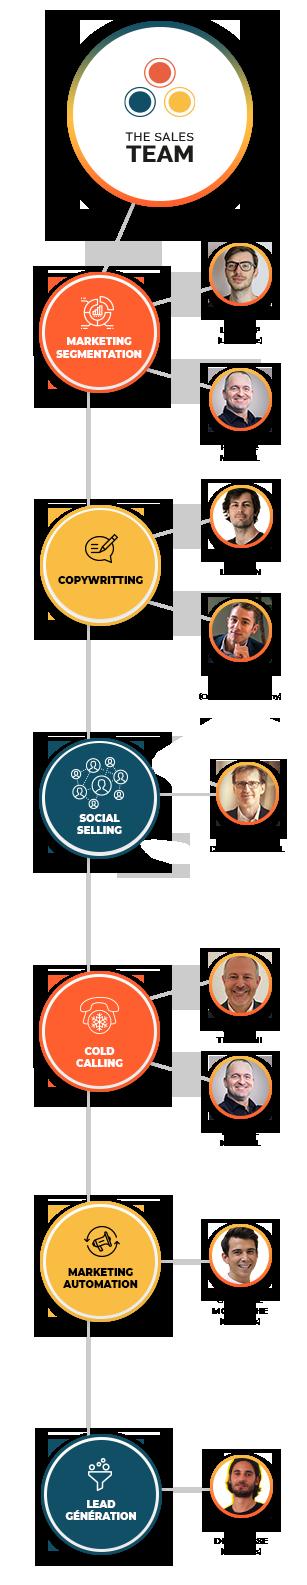 Equipe - The Sales Team